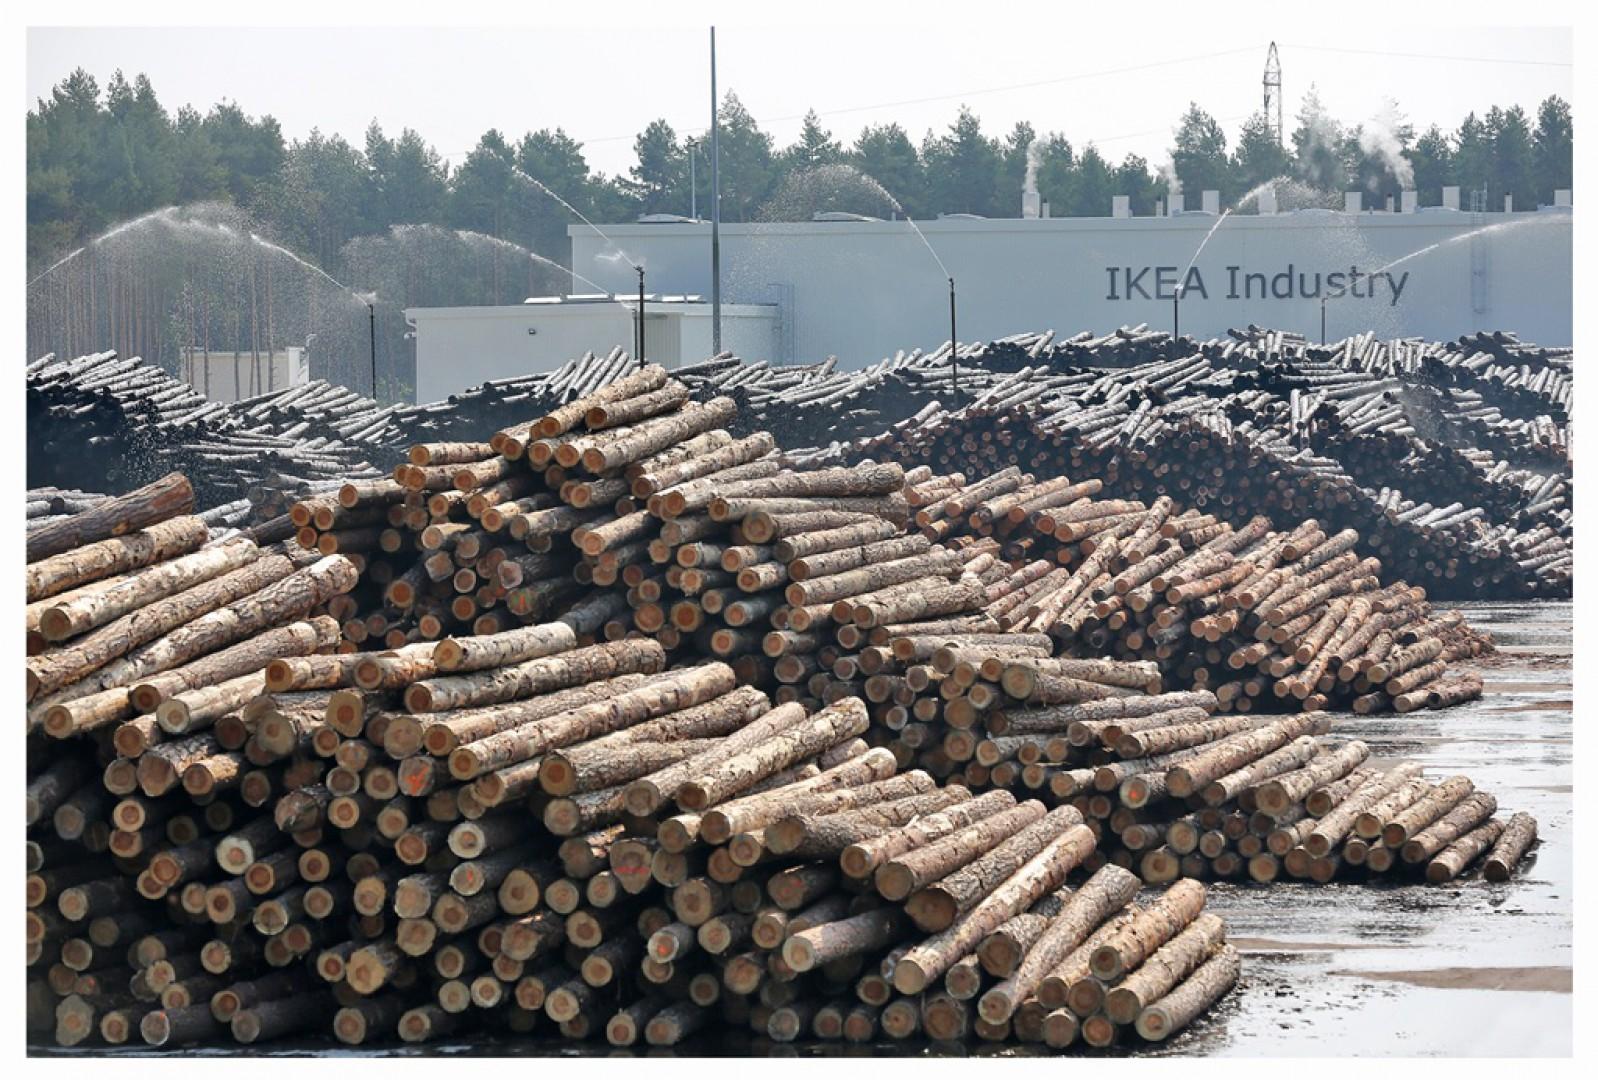 Tartak IKEA Industry w Stalowej Woli. Fot. IKEA